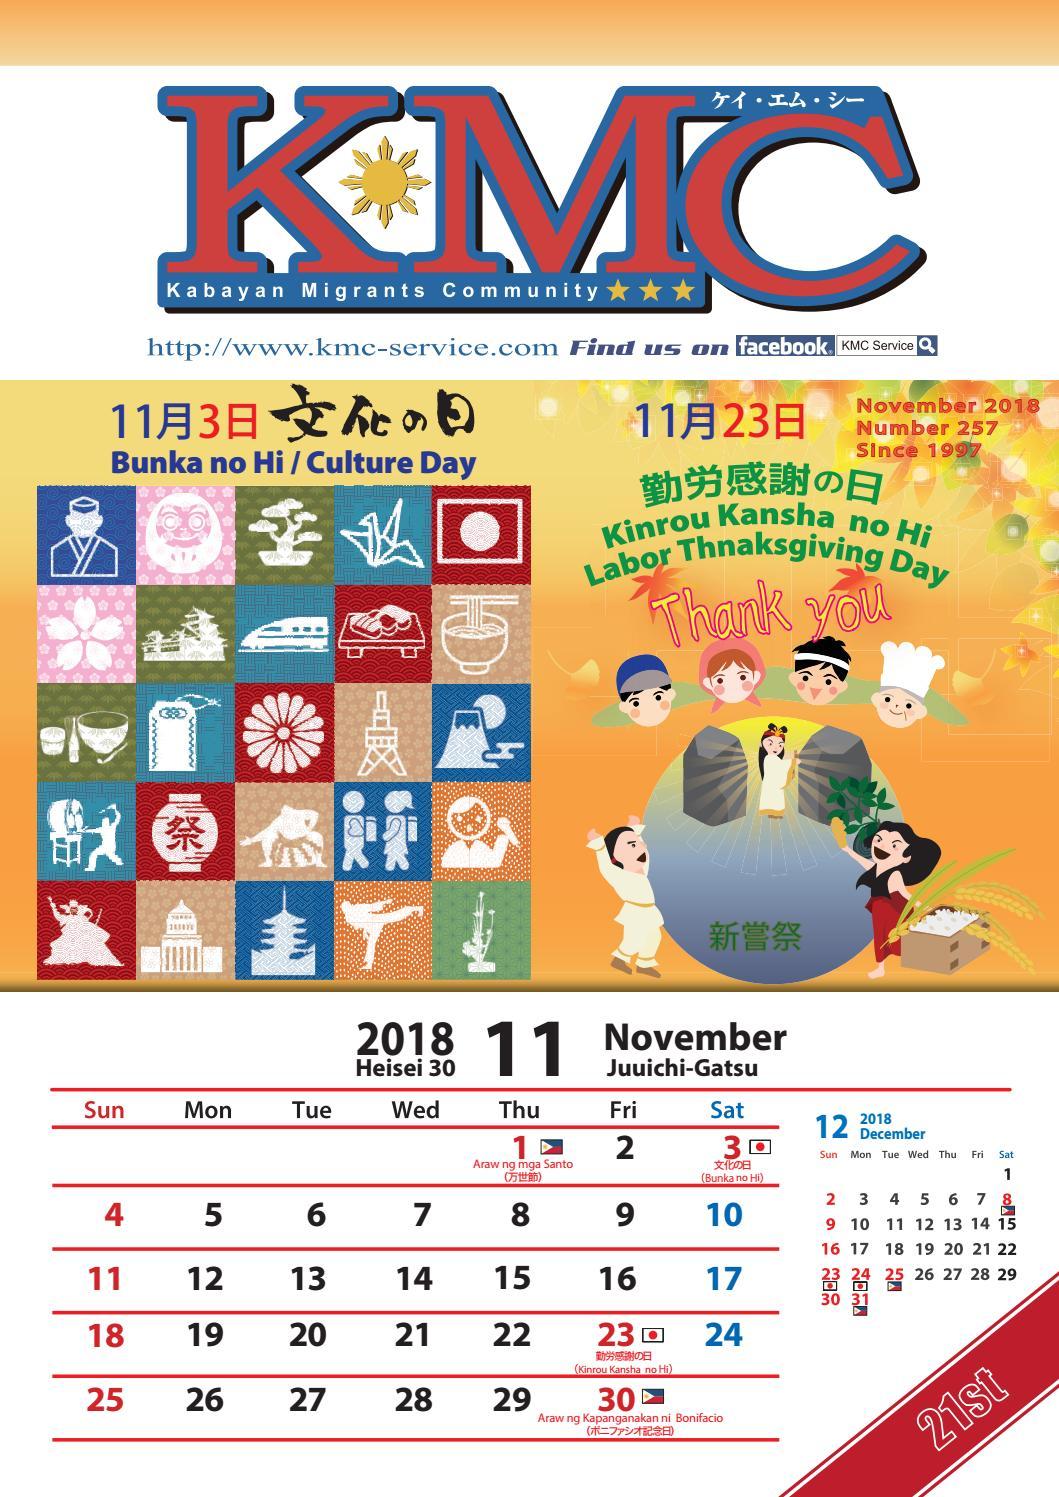 KMC MAGAZINE NOVEMBER 2018 by KMC Service - issuu